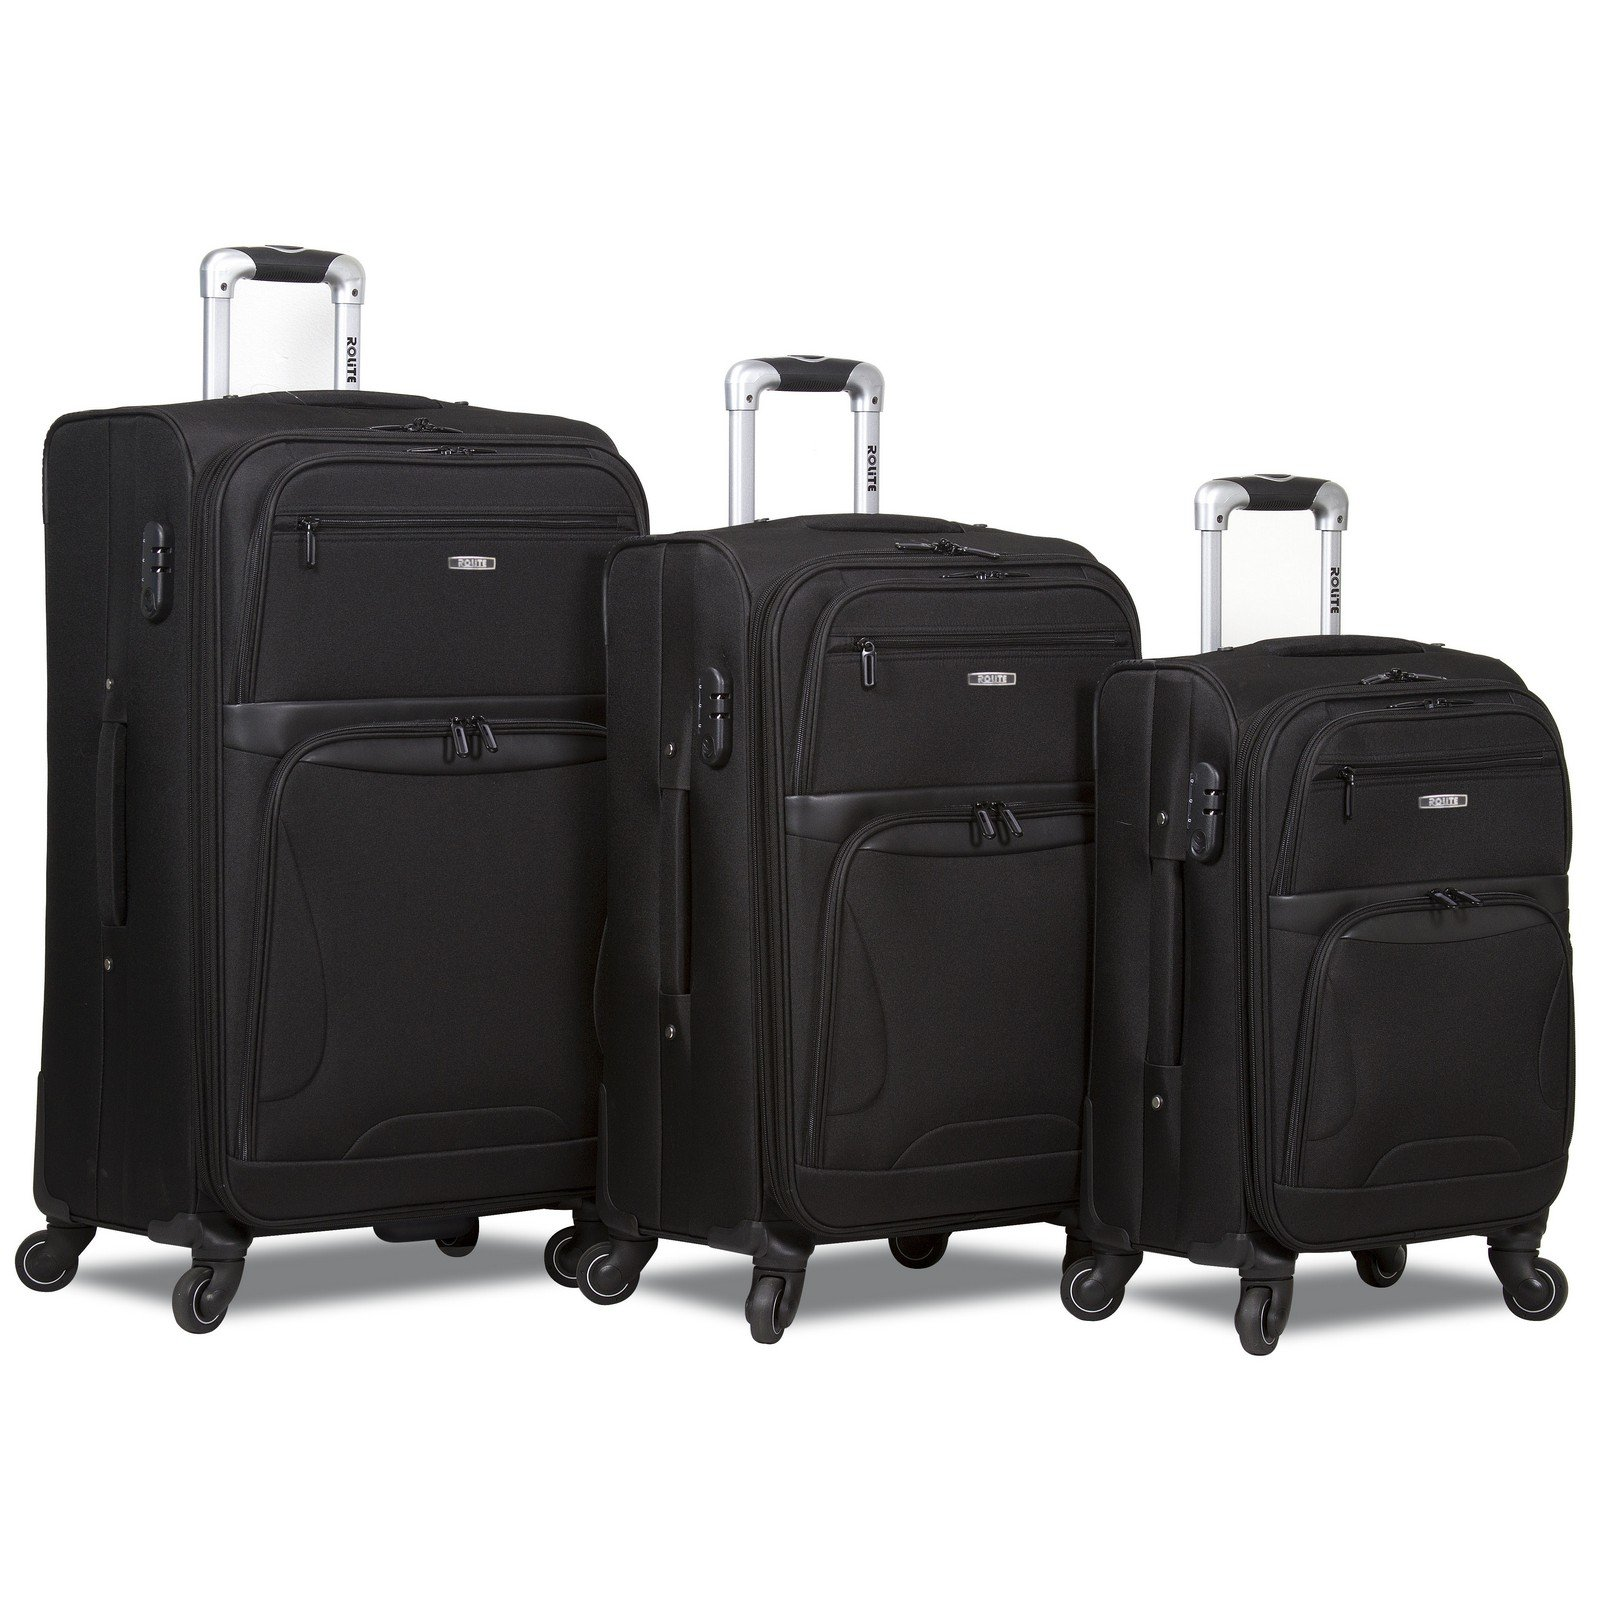 Rolite Explorer 3-Piece Expandable Spinner Luggage Set, Black